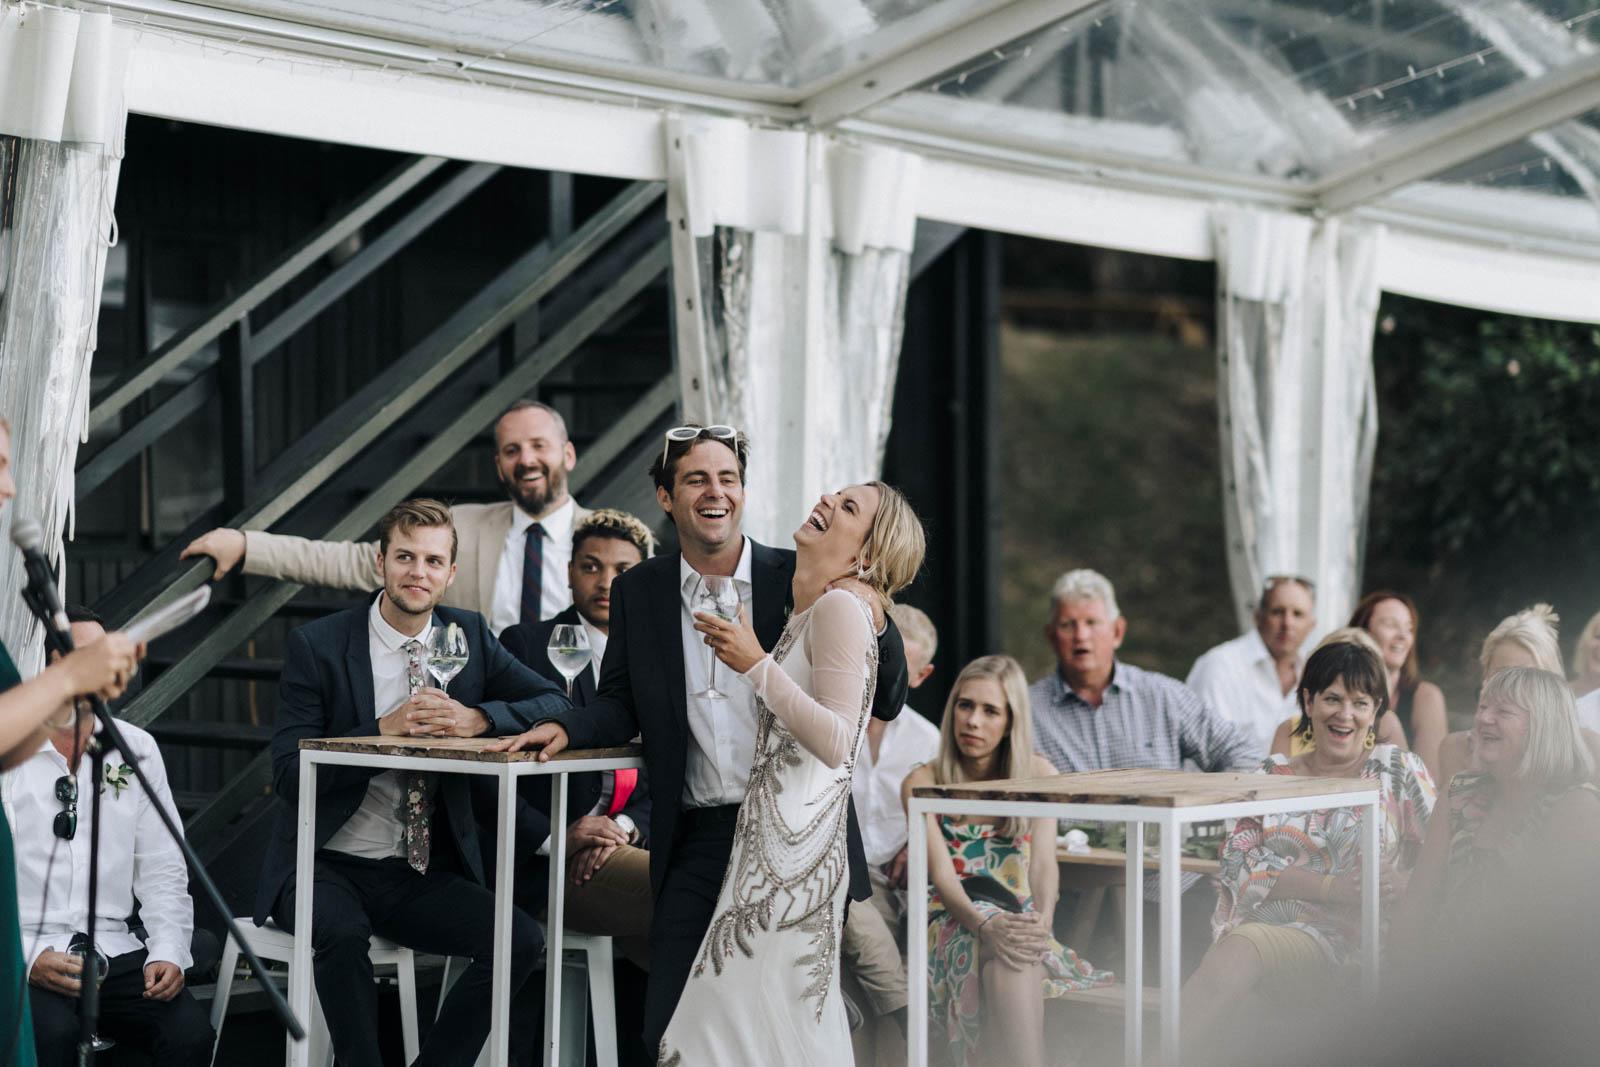 newfound-l-i-coromandel-wedding-photographer-1922-A9_05002